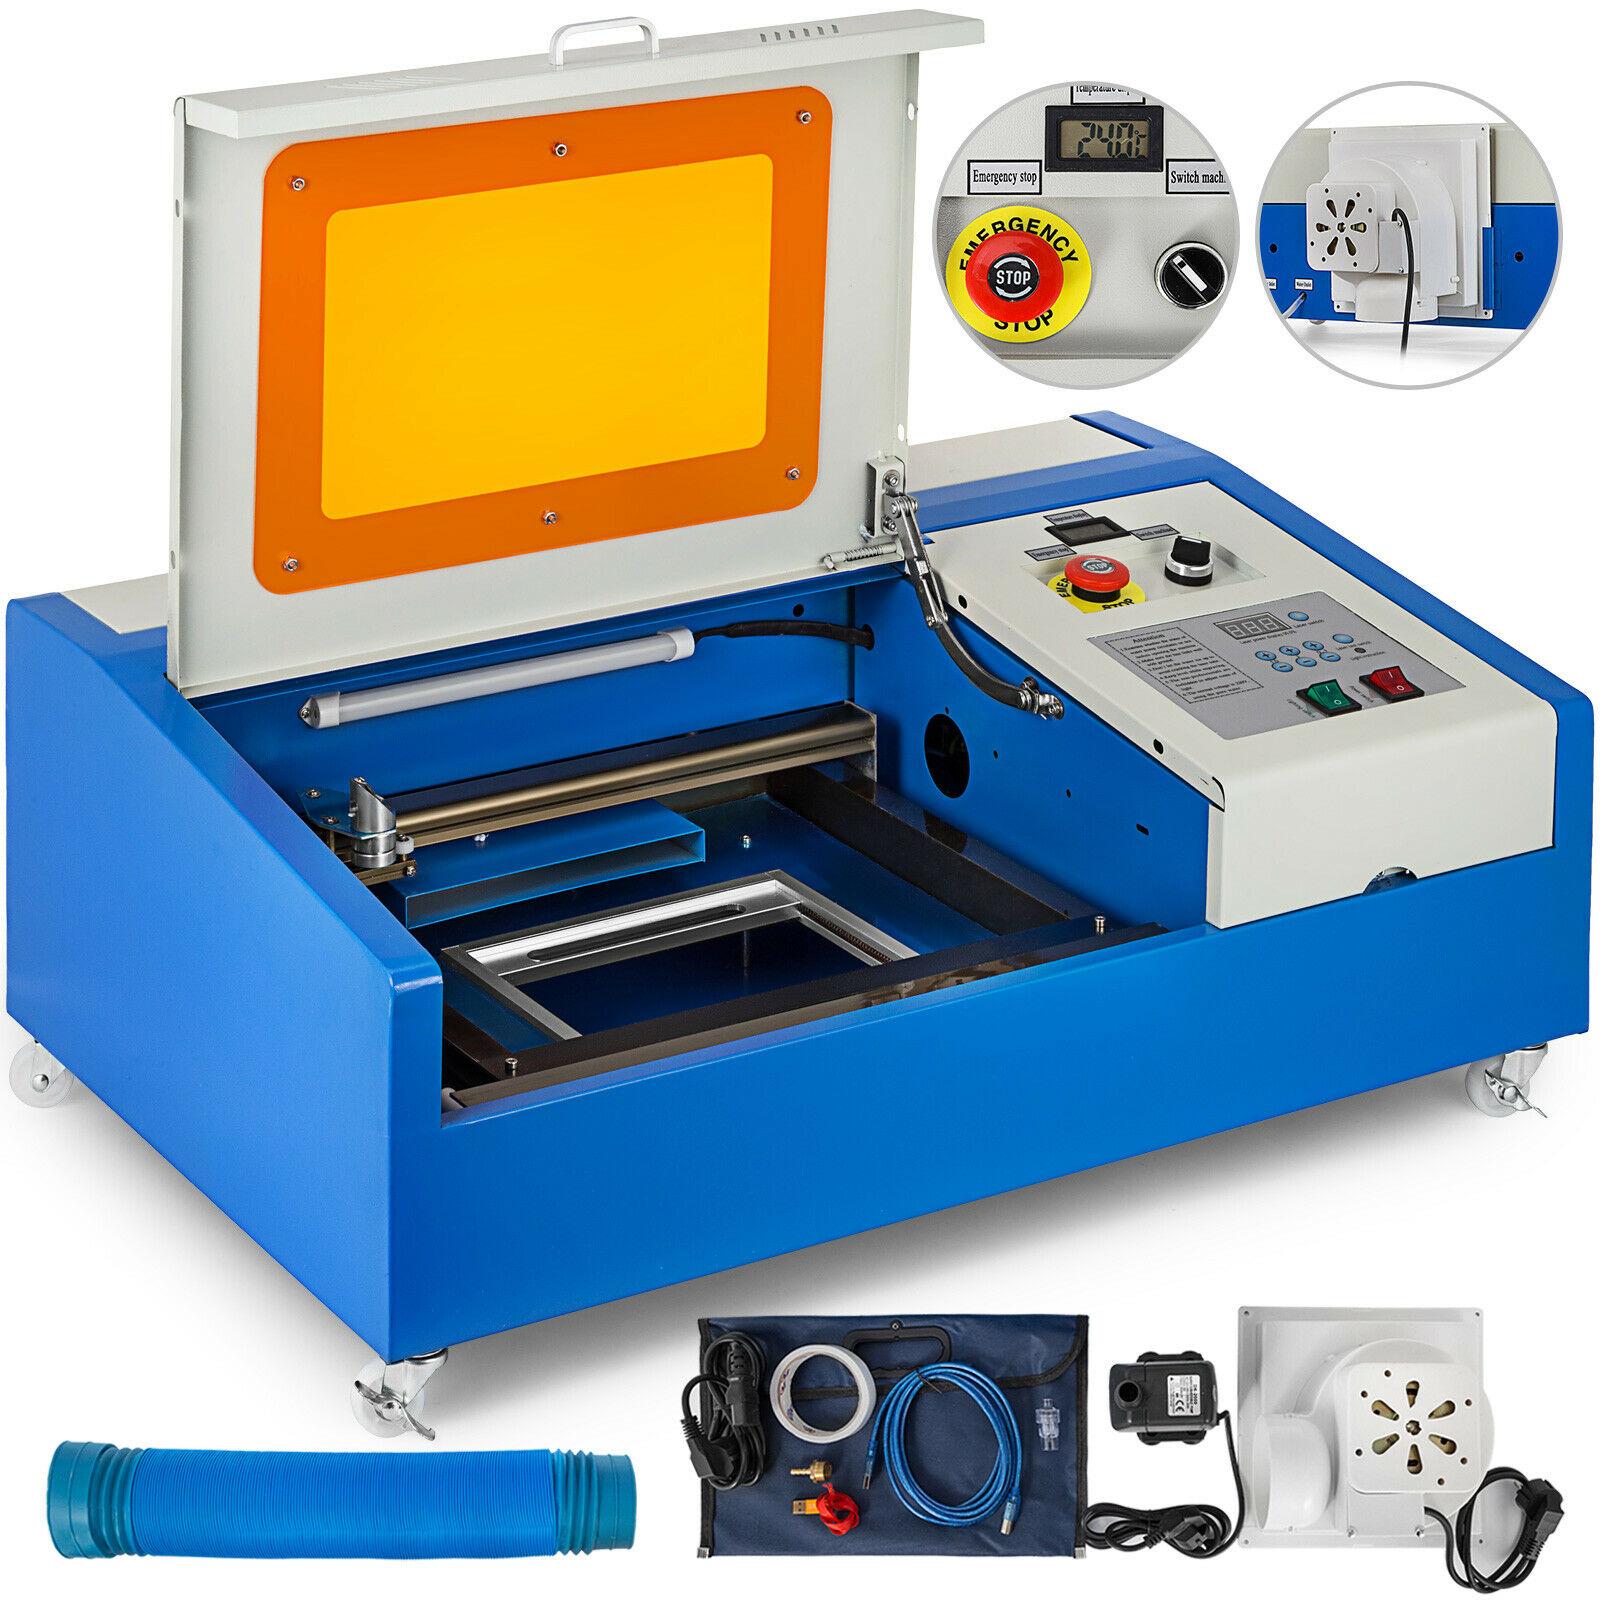 Engraver Cutter Laser 40W CO2  Engraving Cutting Machine 300x200mm LCD+ 4  Wheels  USB  Port